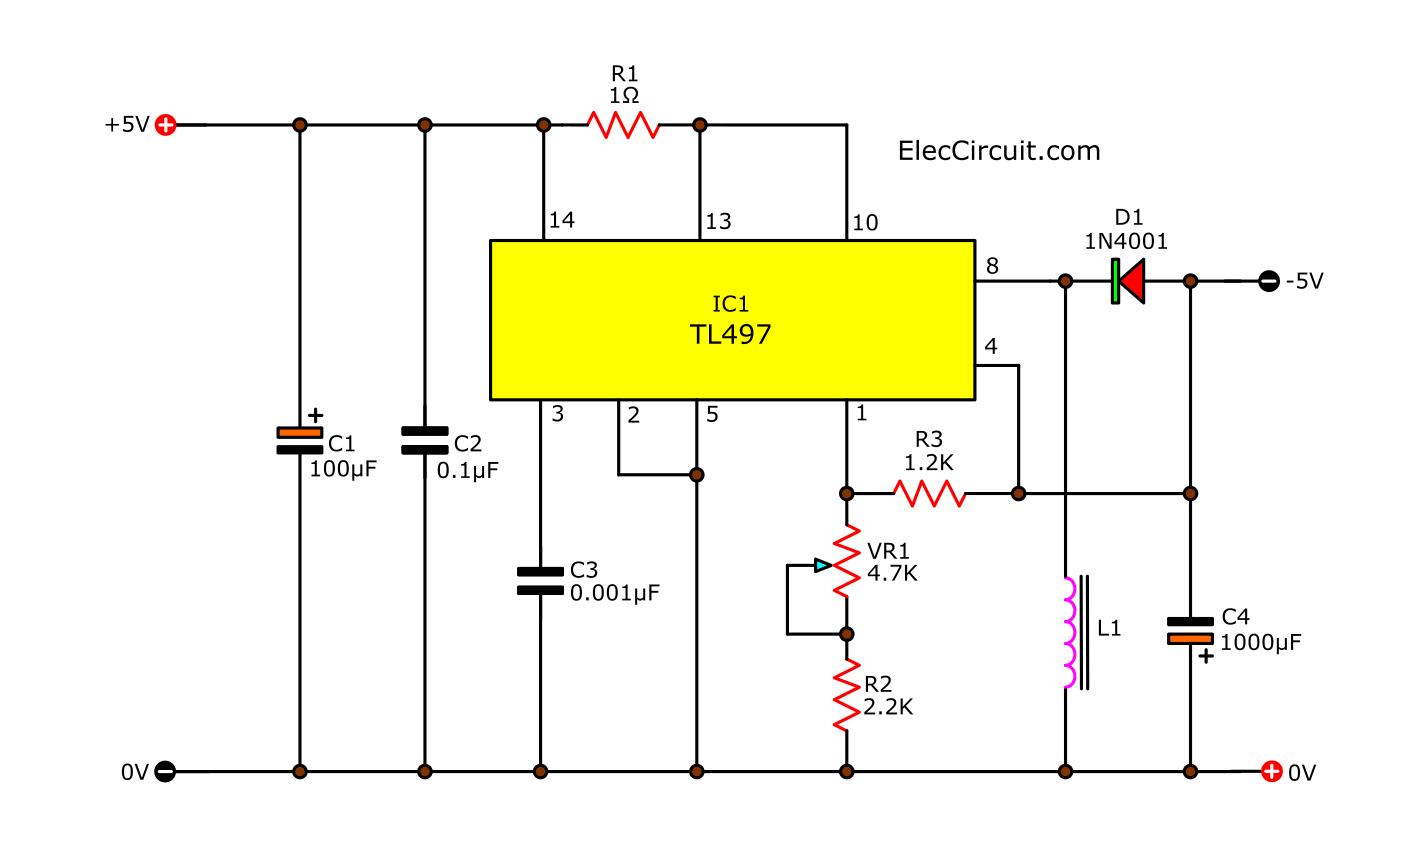 -5V Negative DC converter using TL497